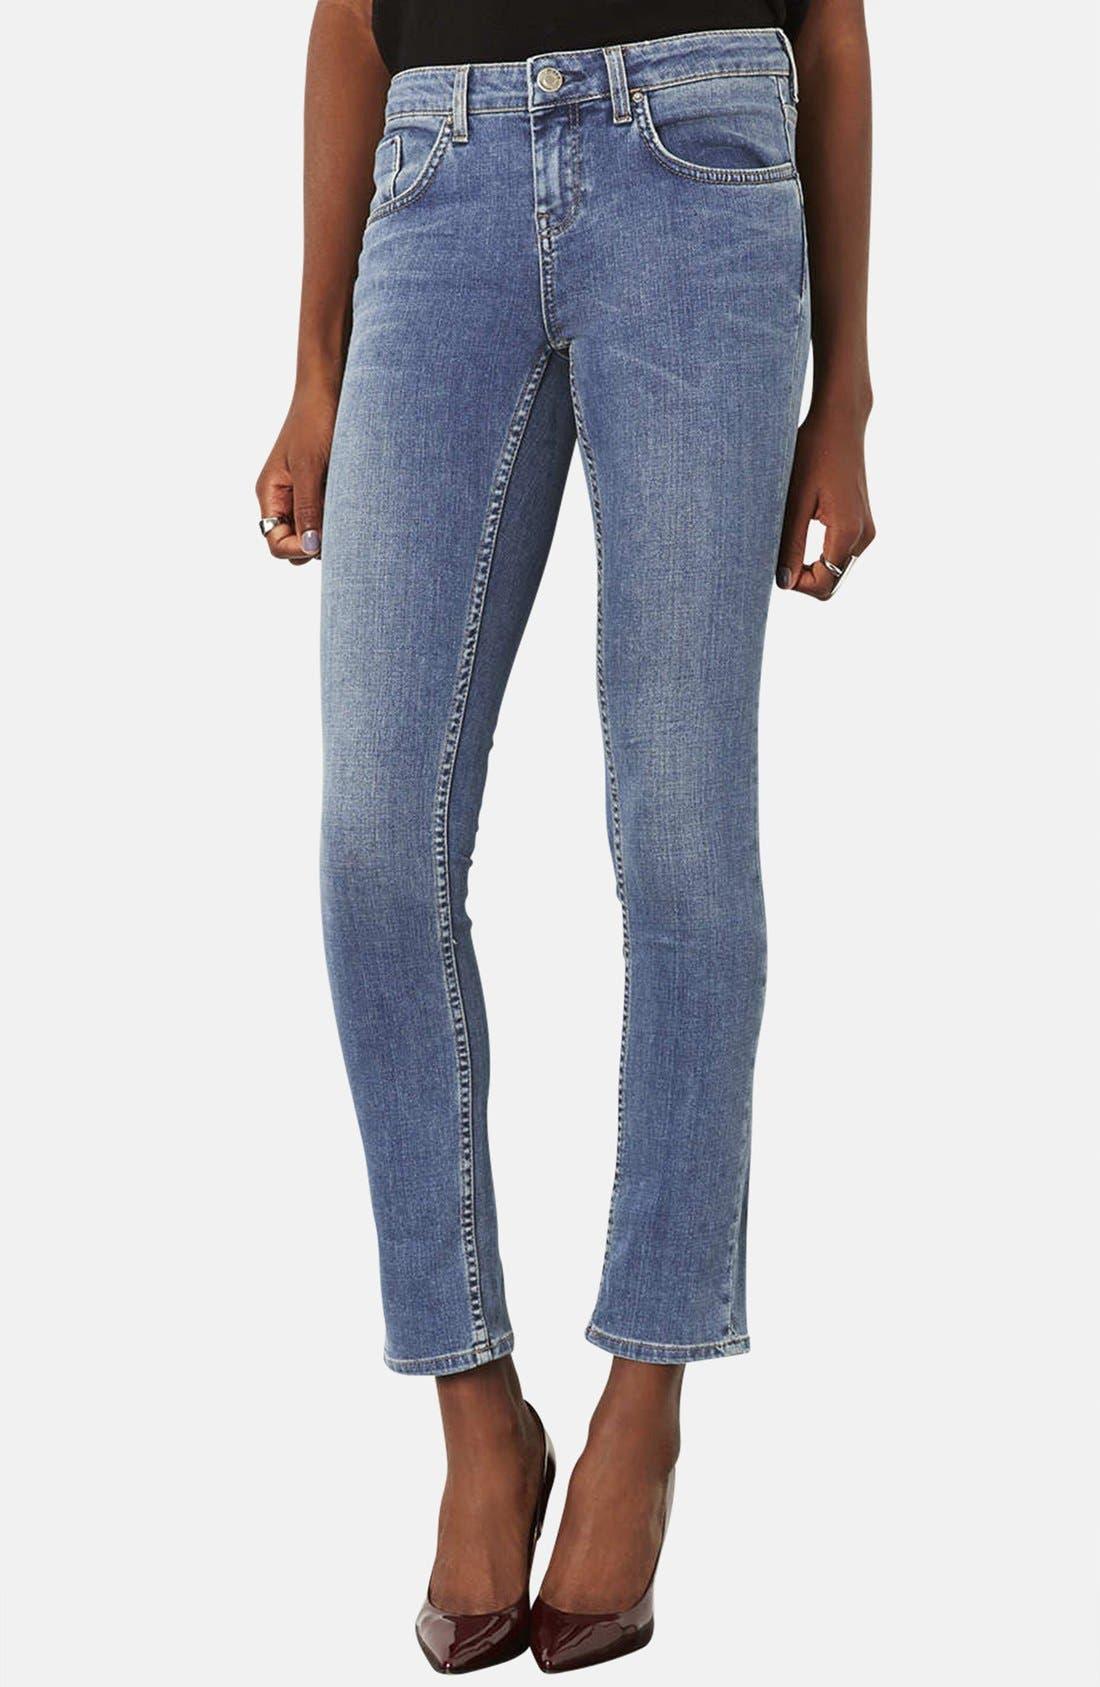 Alternate Image 1 Selected - Topshop Moto 'Vintage Baxter' Skinny Jeans (Mid Stone) (Short)